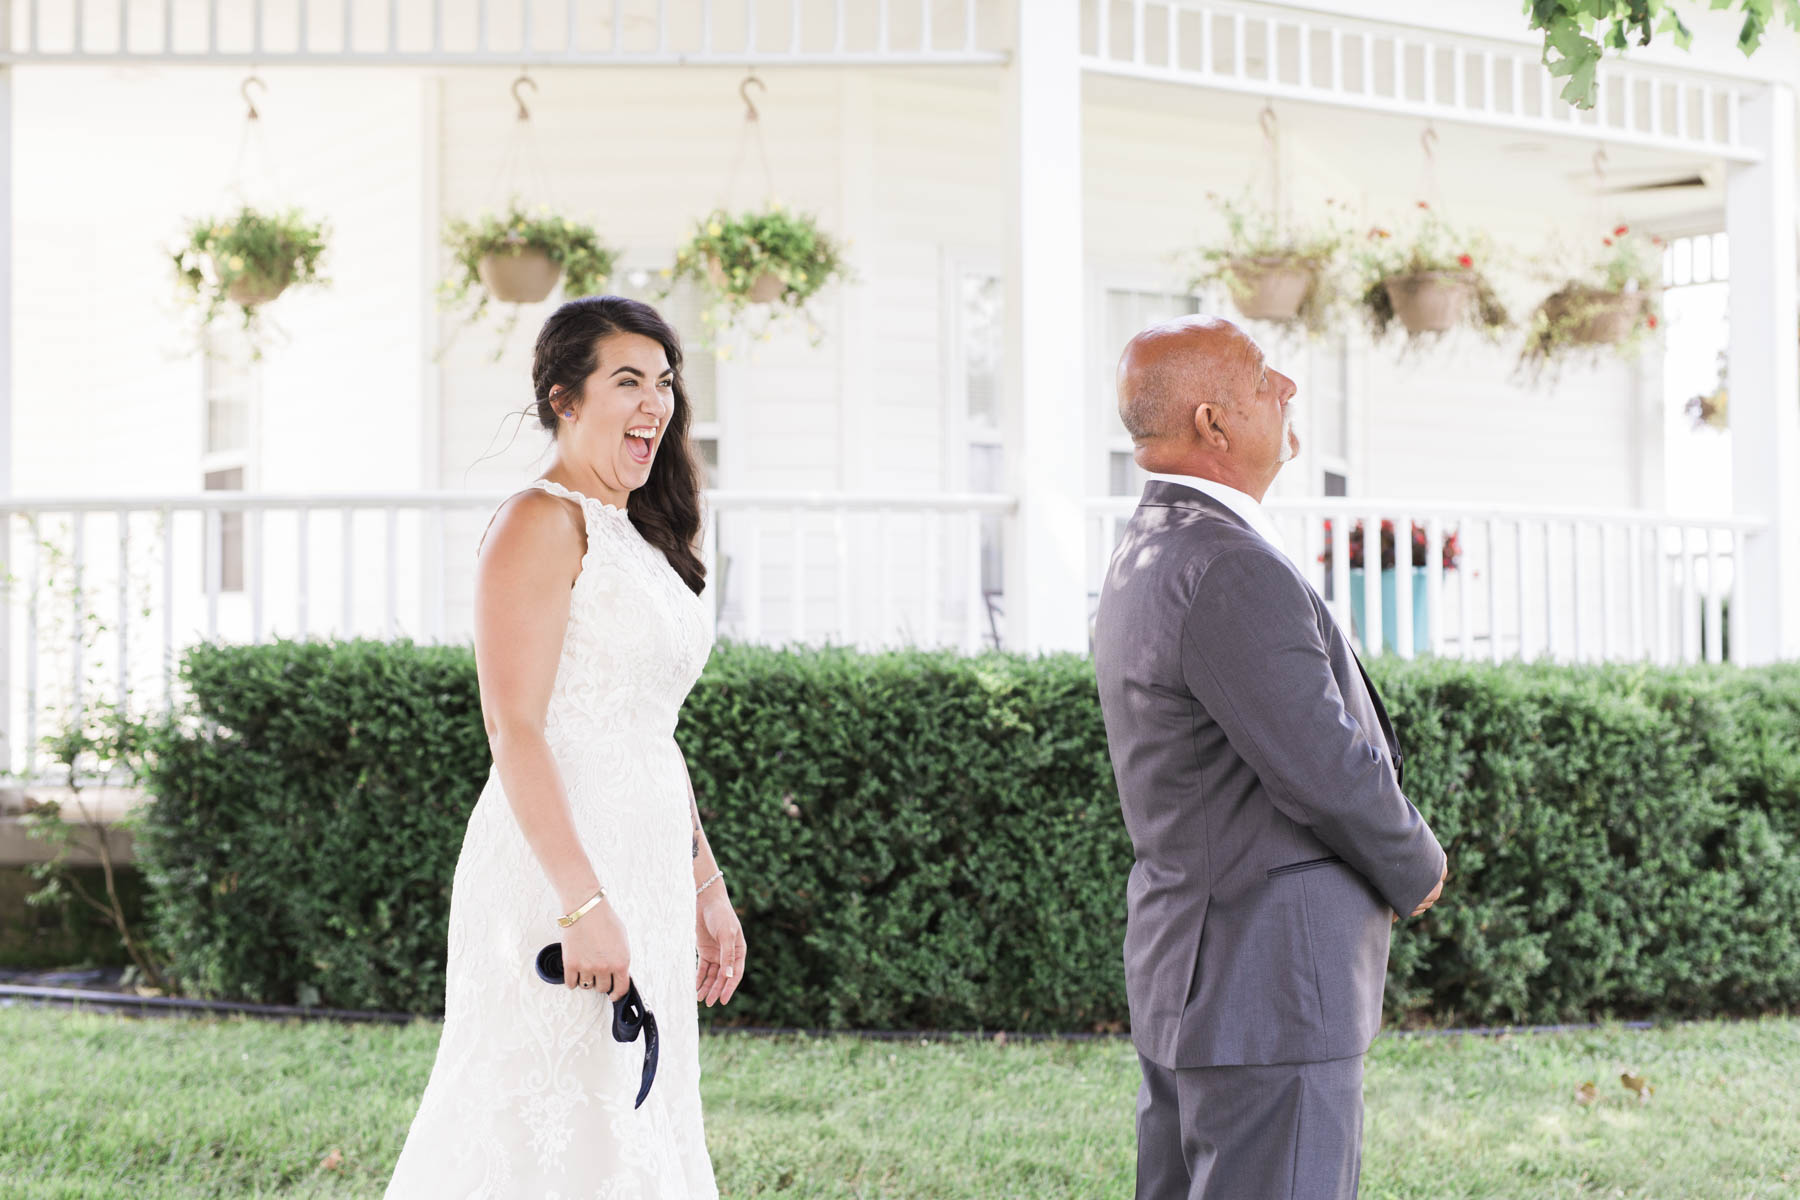 shotbychelsea_wedding_blog-15.jpg